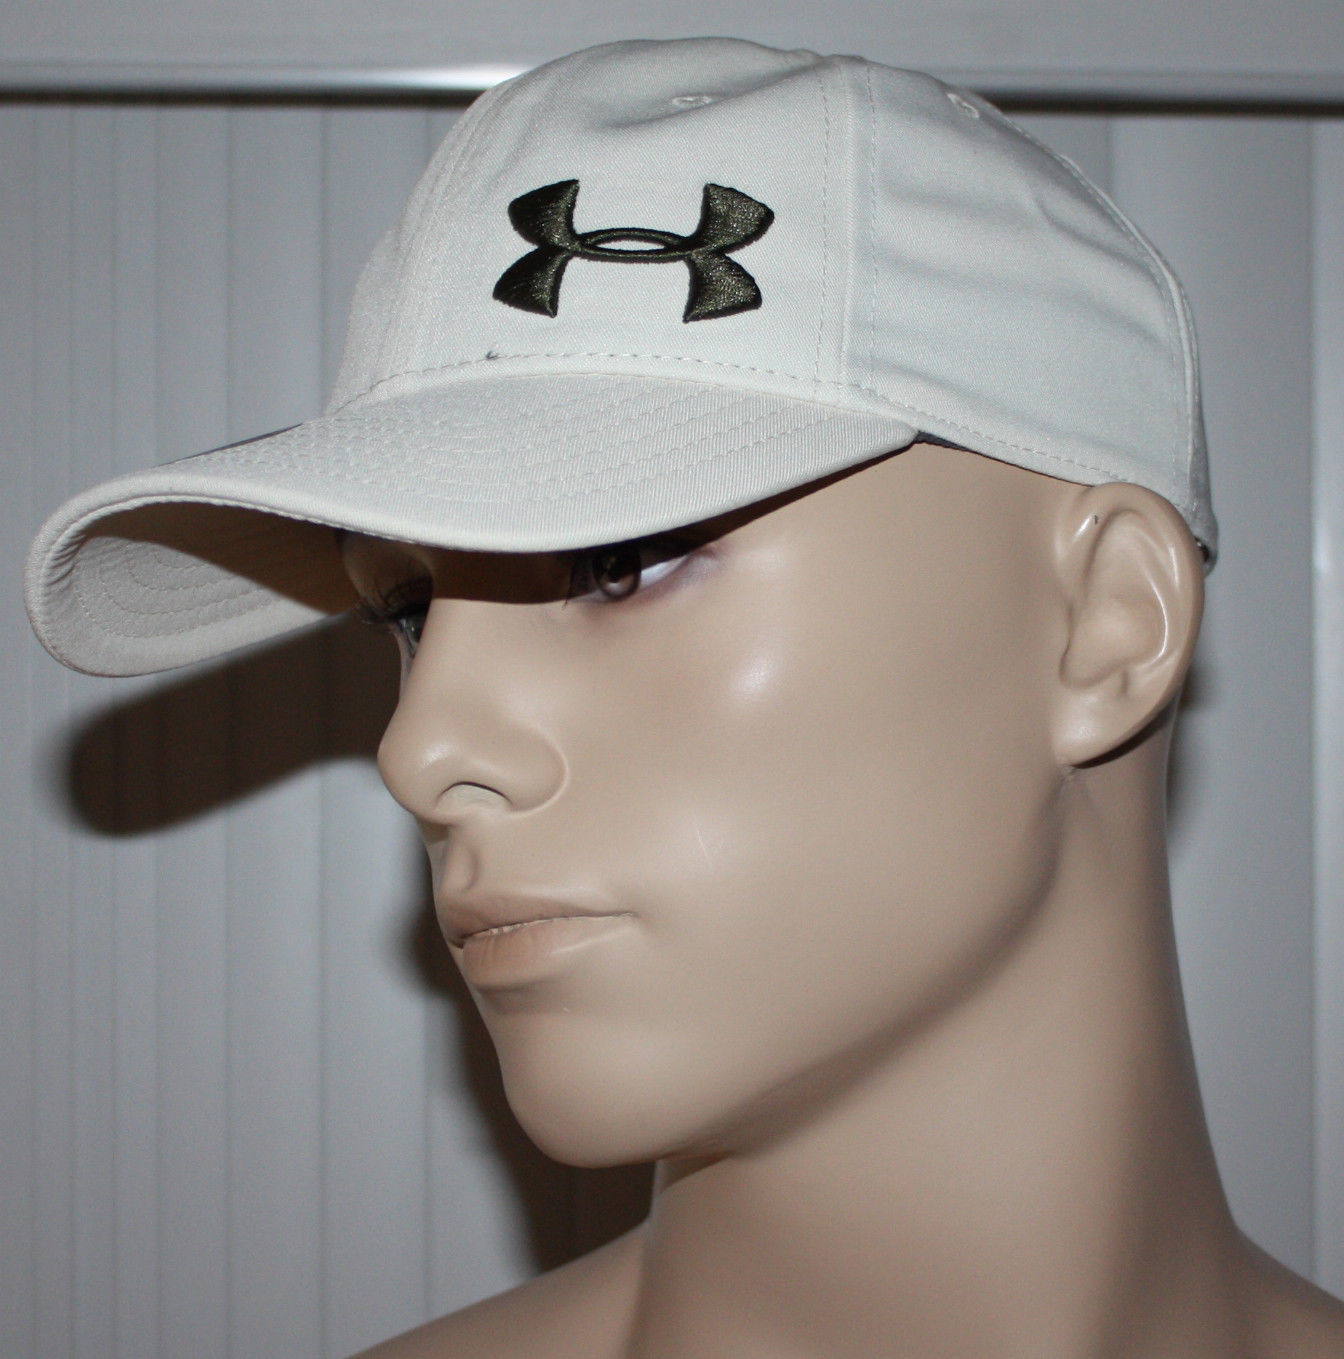 Under Armour Heatgear Men's Adjustable Hat -Cream 10939